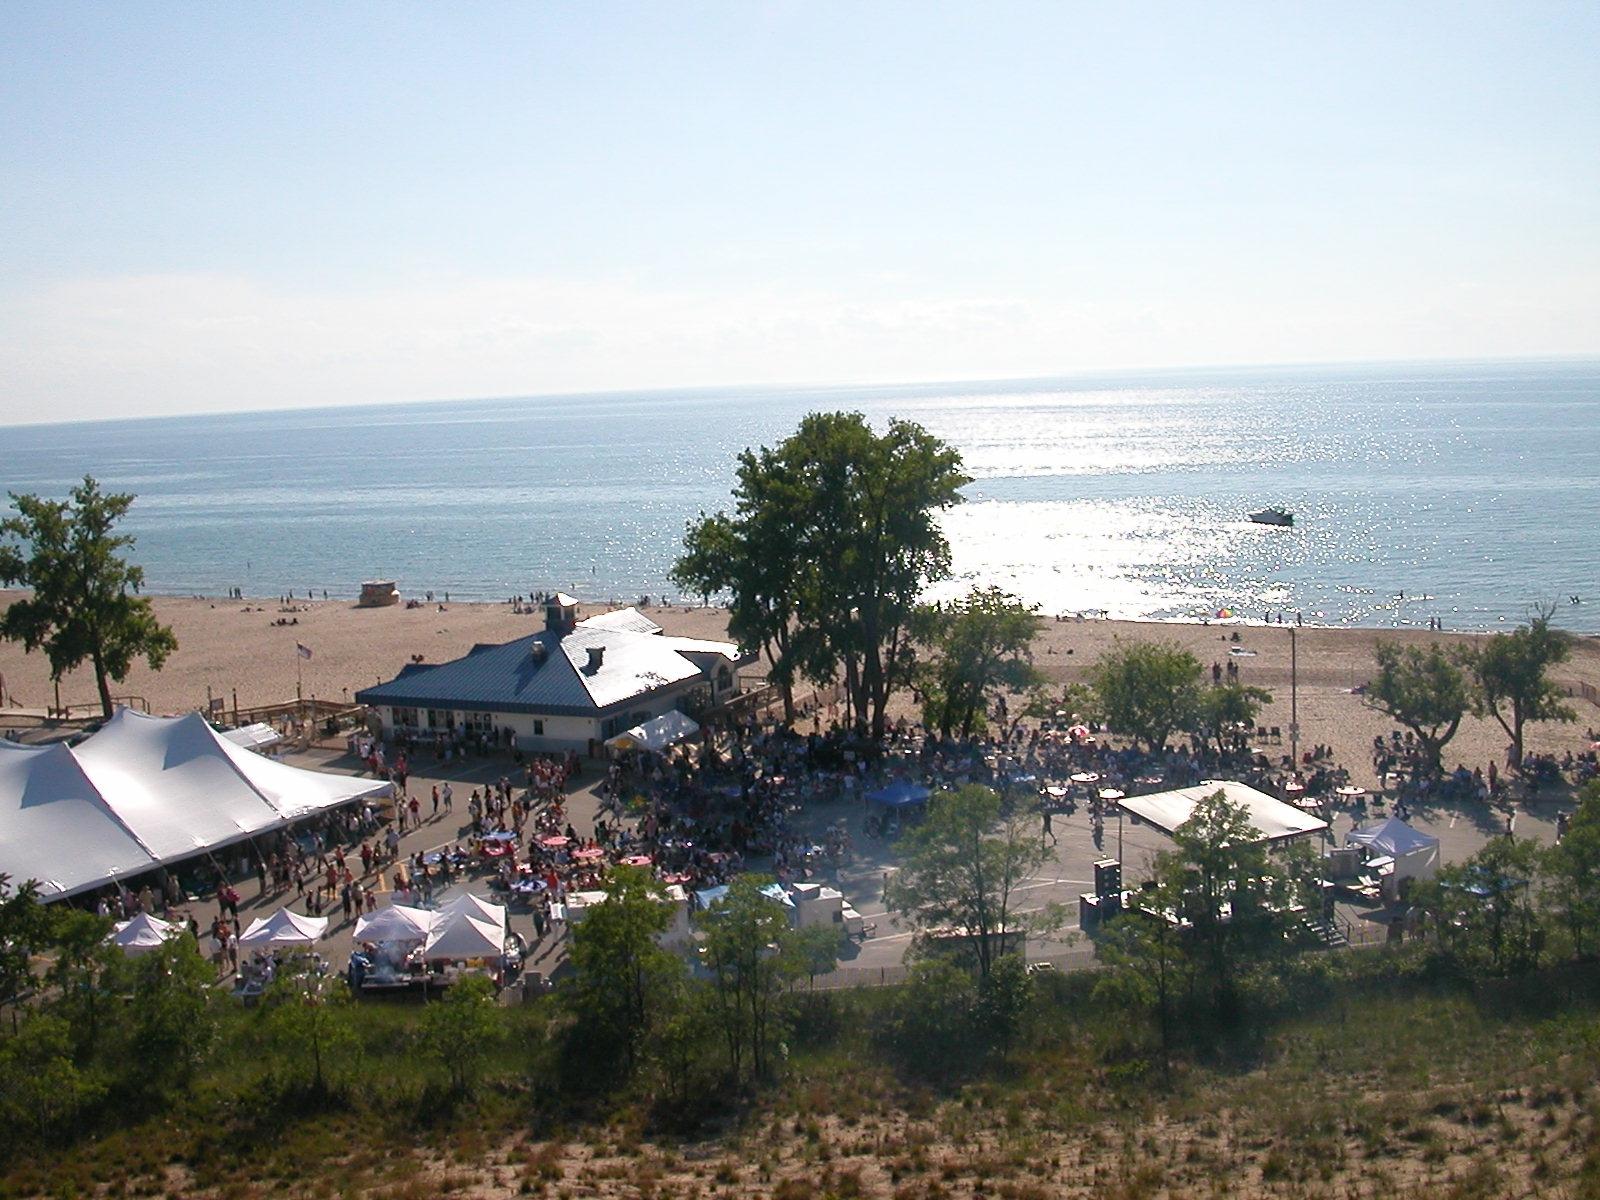 Lake Michigan Shore Wine Festival Bridgman, MI